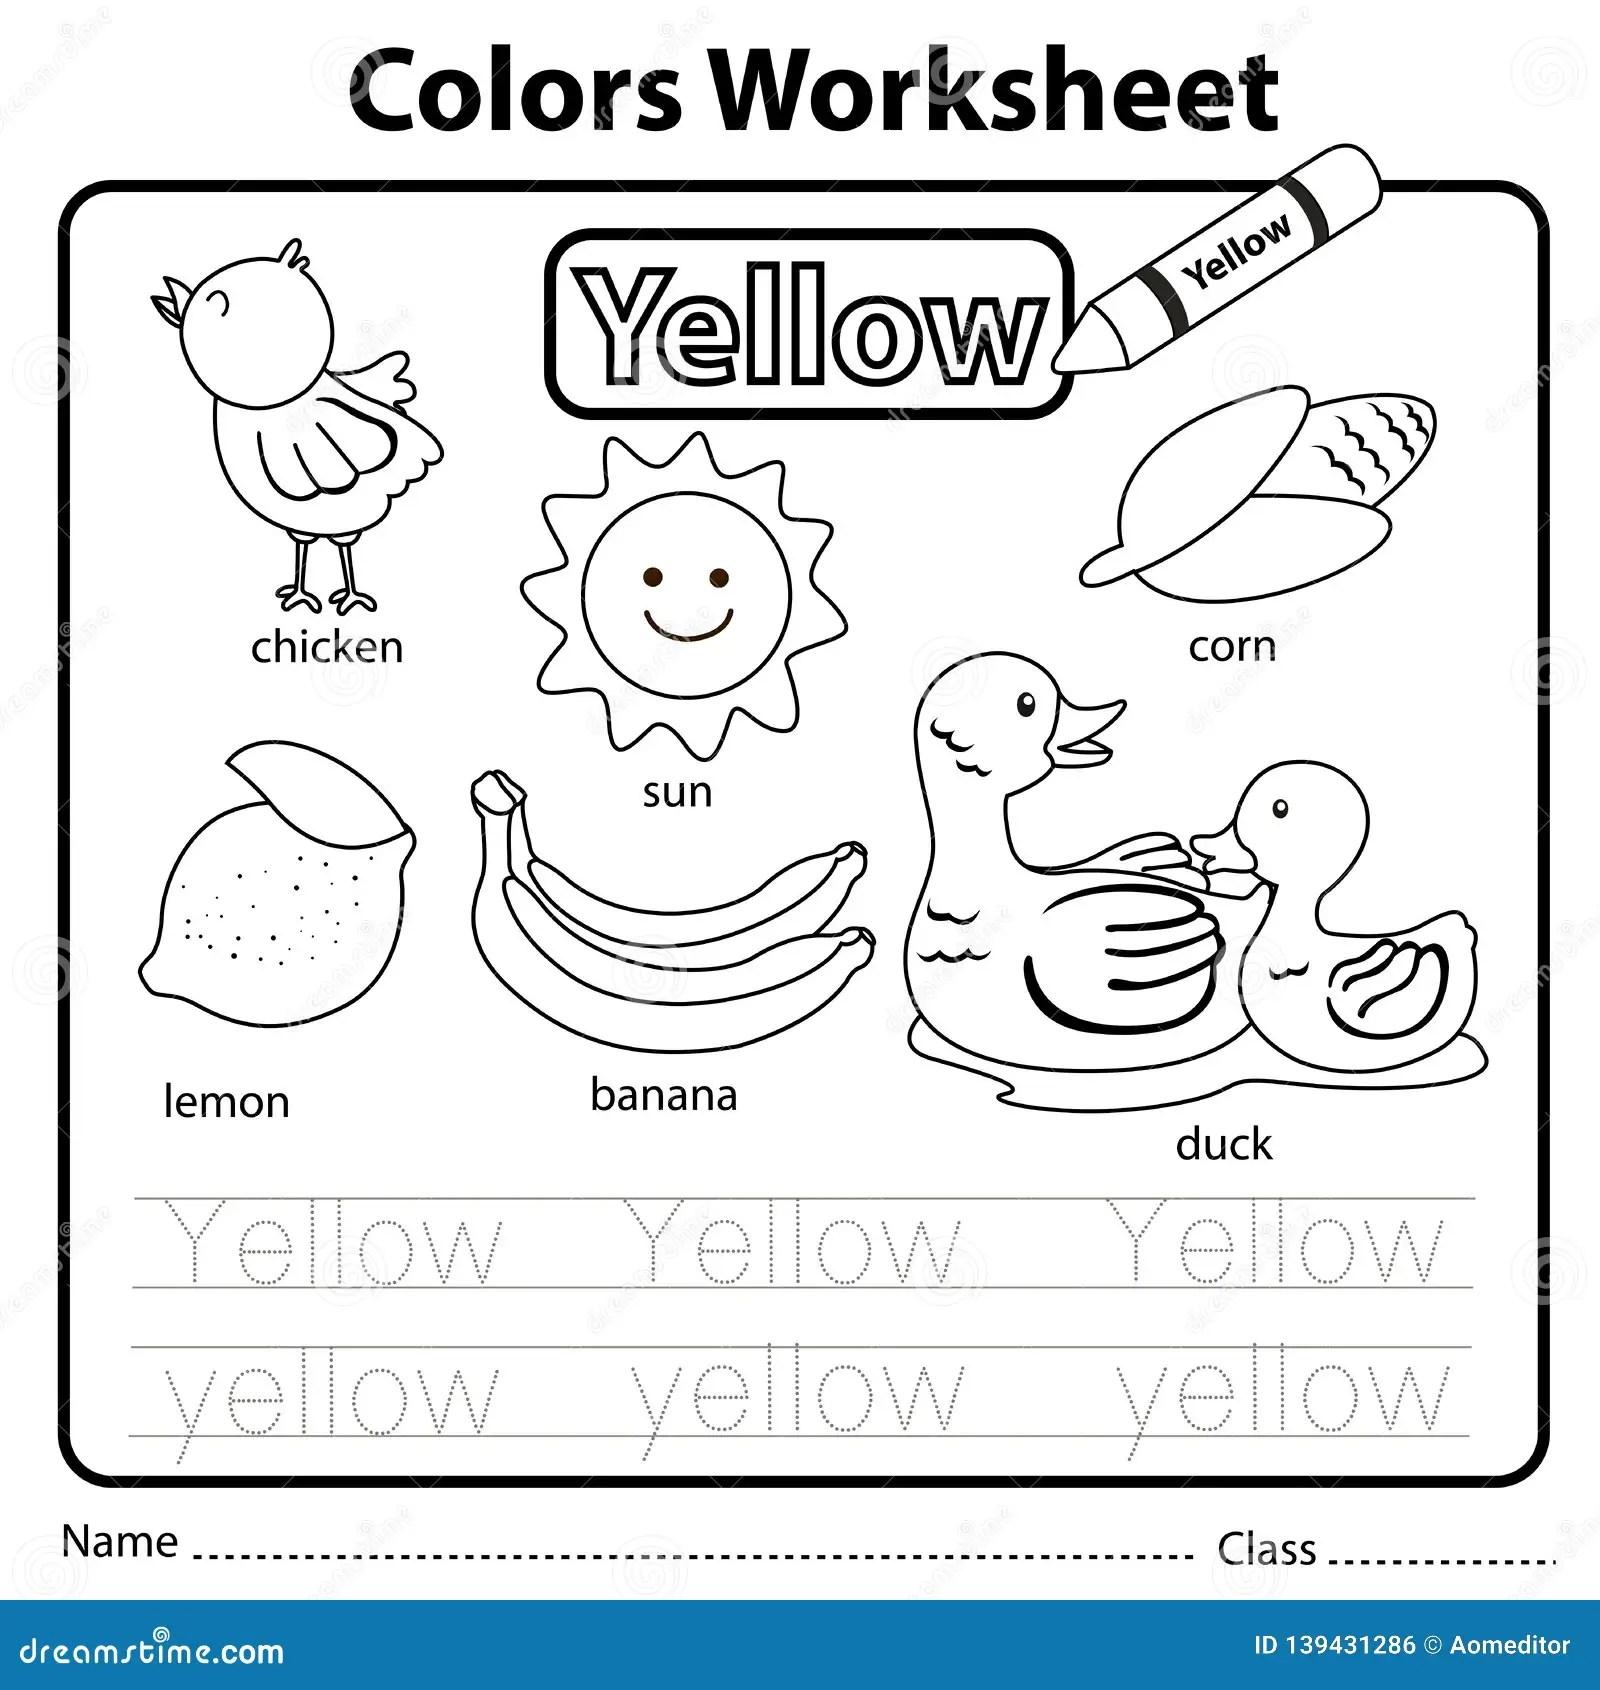 Illustrator Of Color Worksheet Yellow Stock Vector